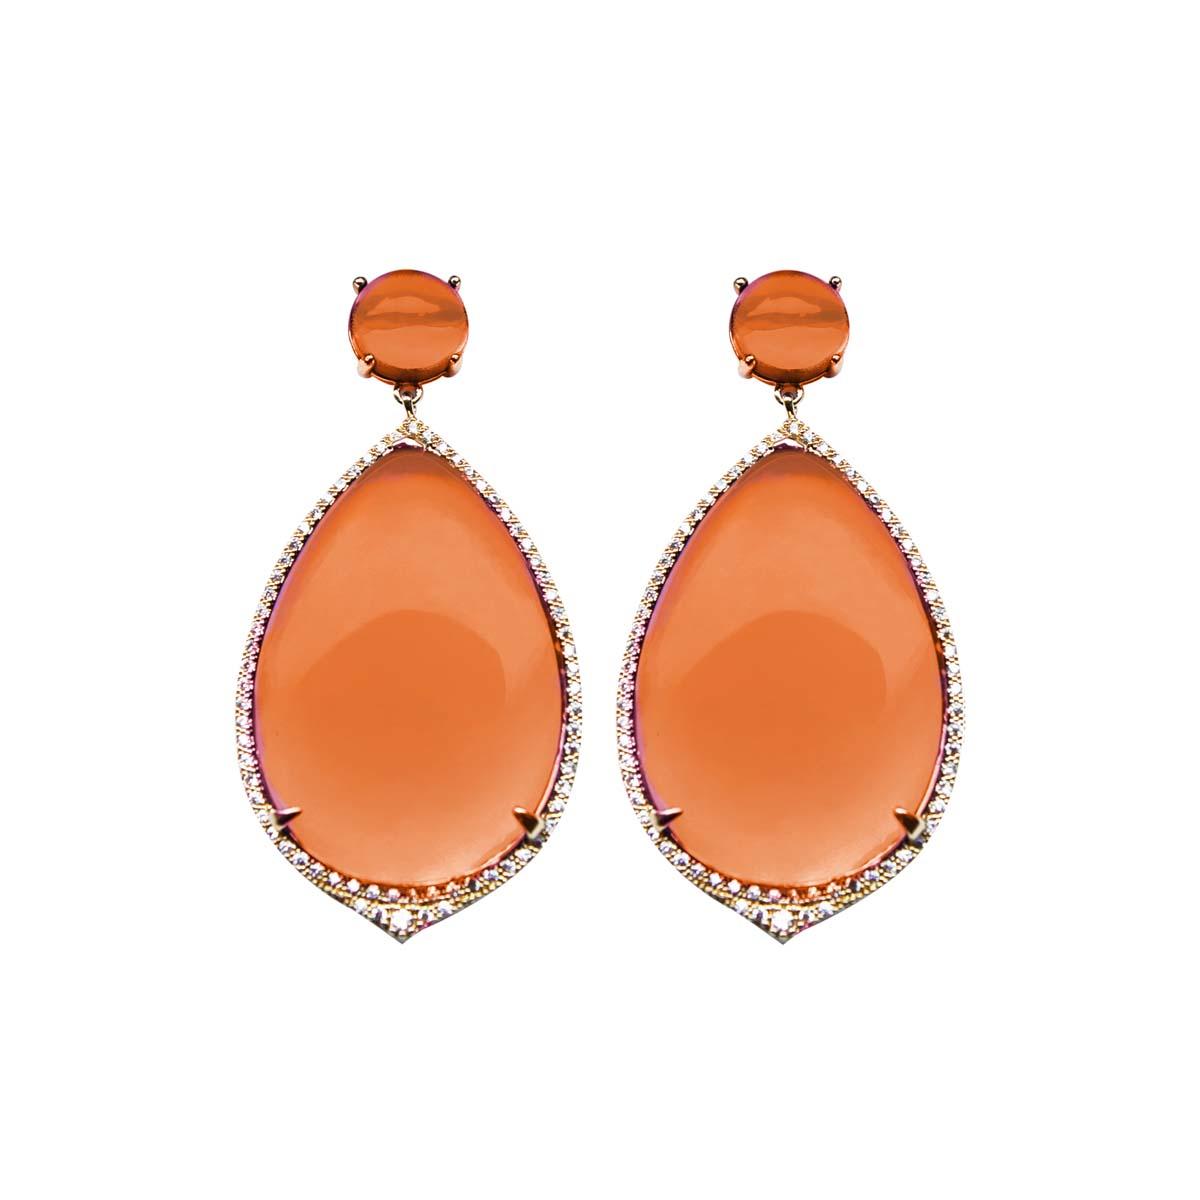 Teria Yabar - Pendientes largos en tono naranja